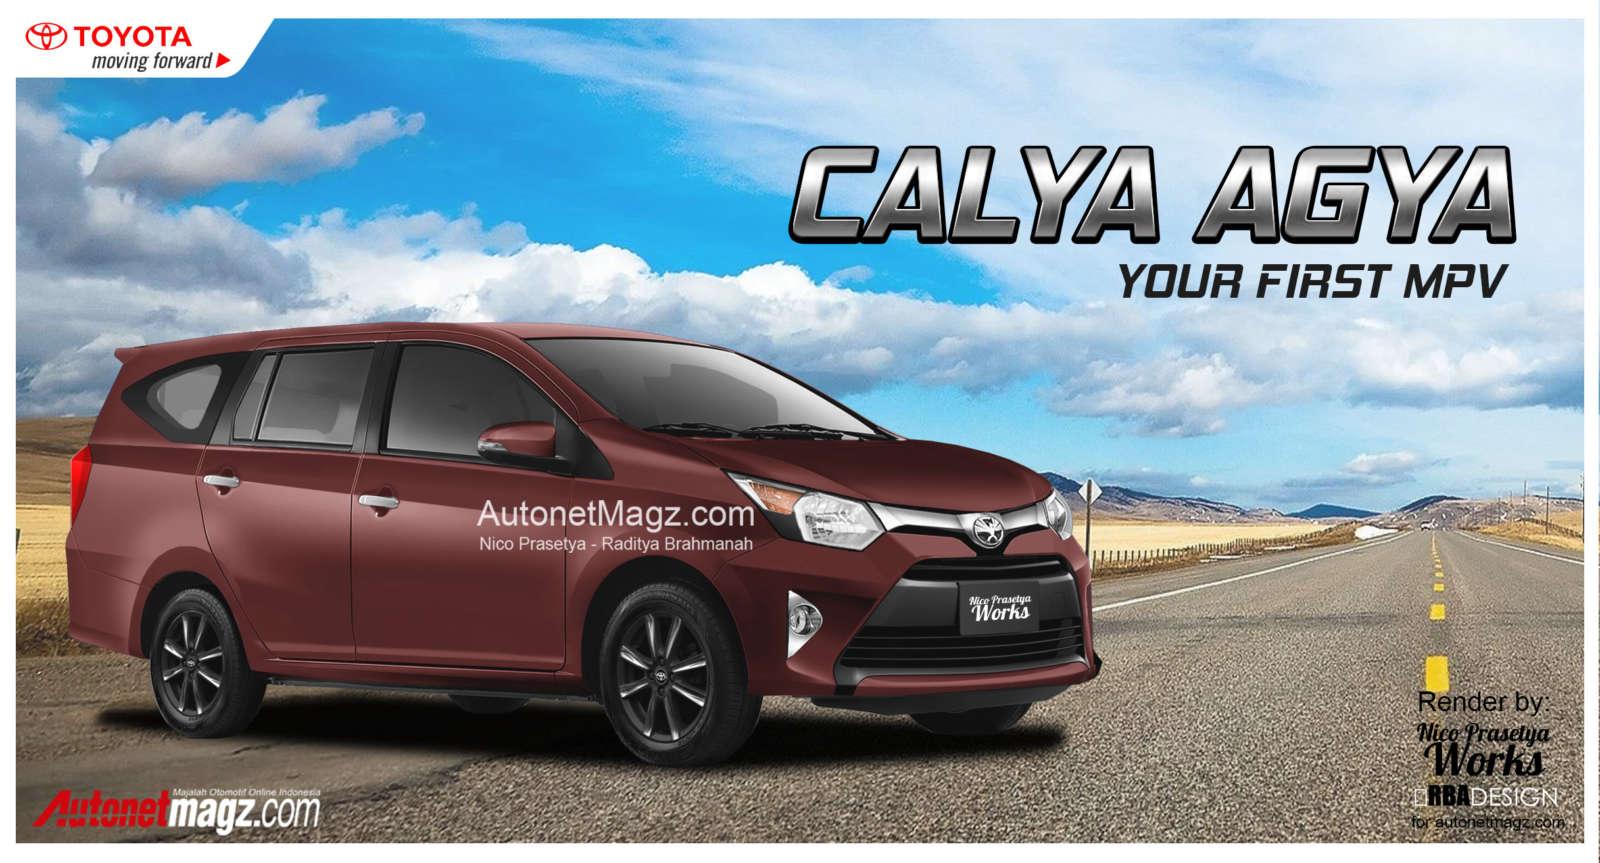 Kelebihan Kekurangan Toyota Calya 2019 Top Model Tahun Ini